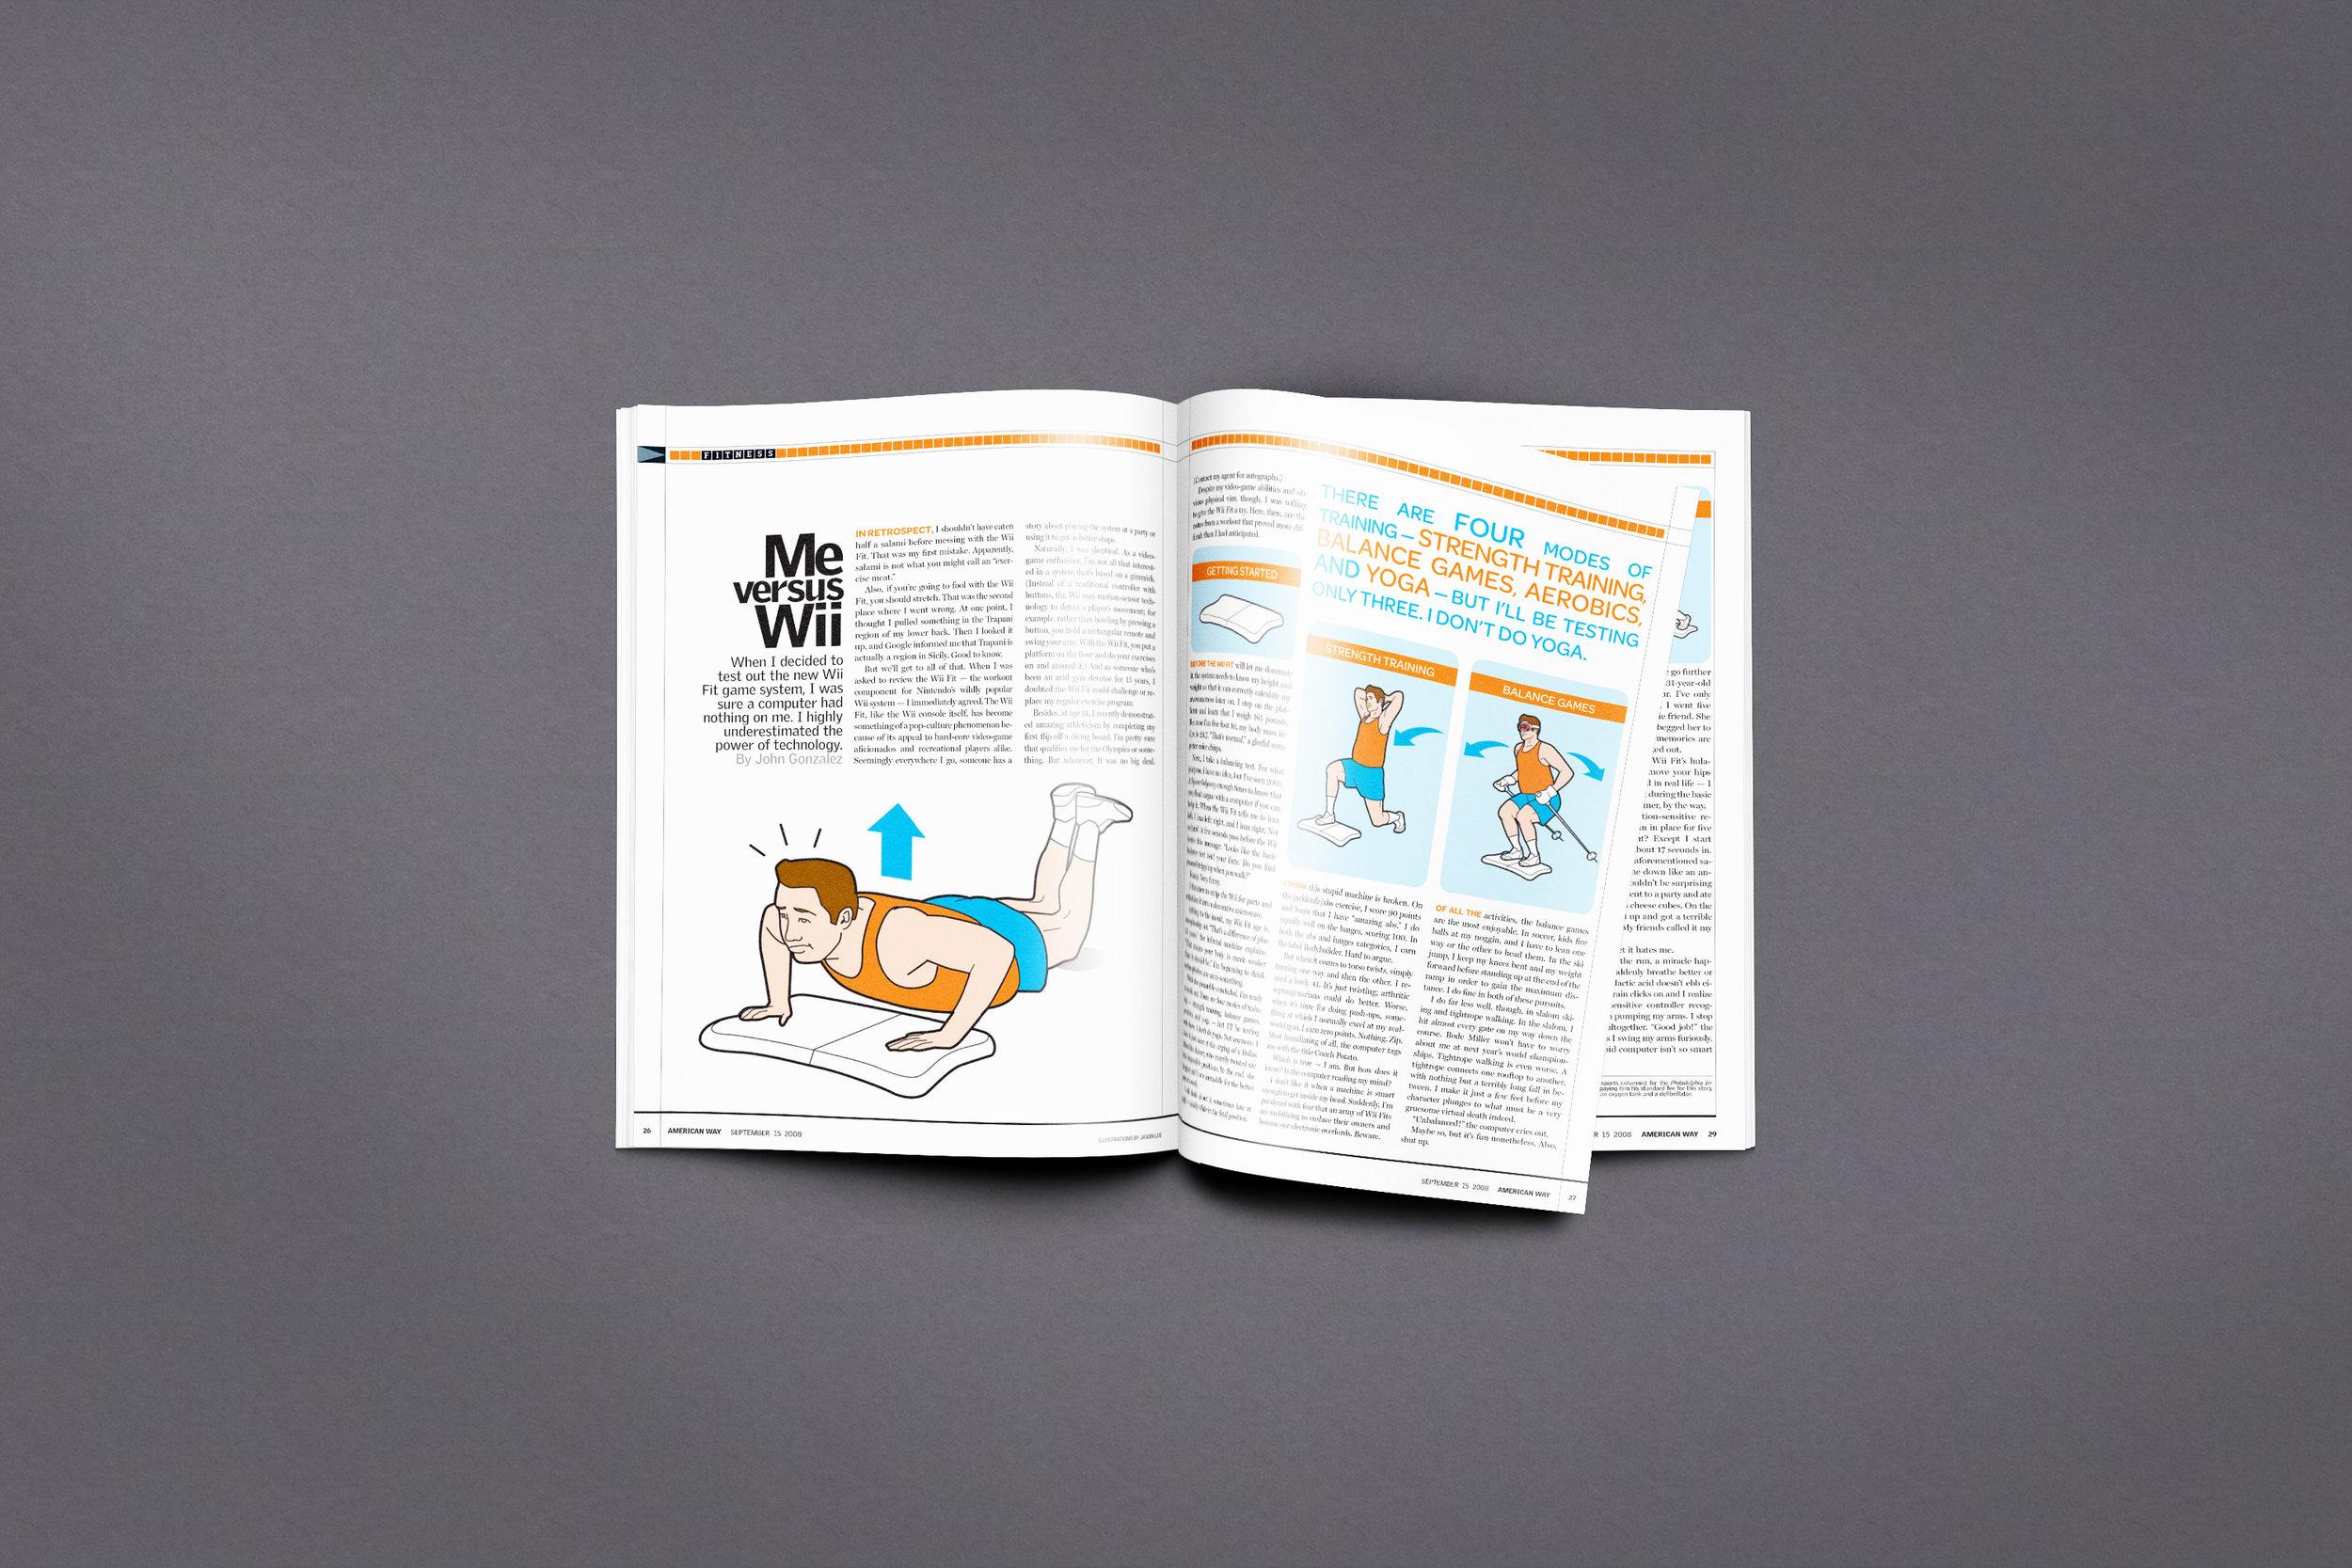 ronaldvillegas-illustration-americanway-mevswii-story.jpg